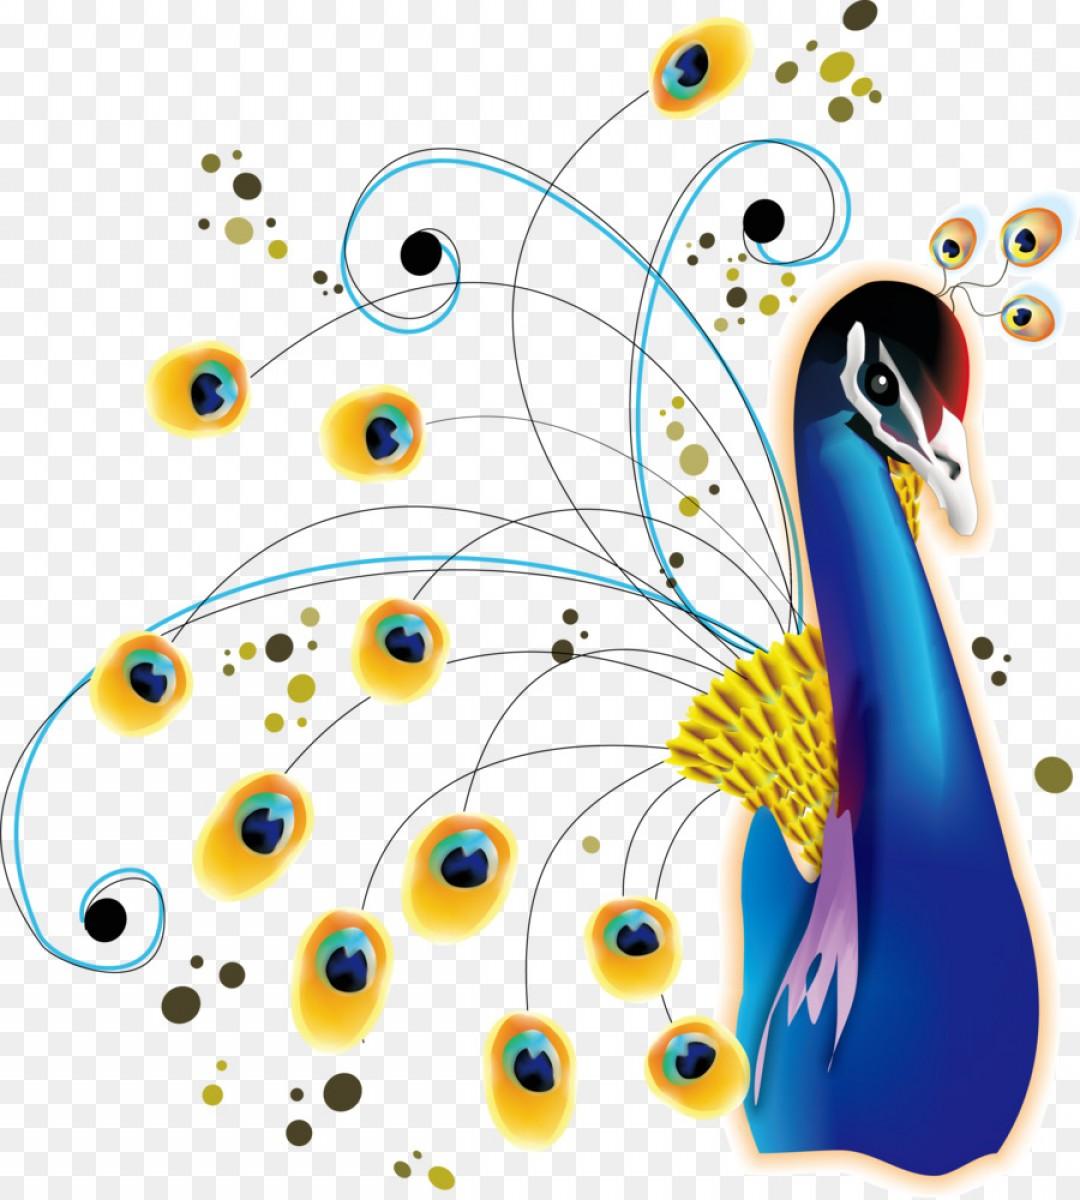 Png Clip Art Vector Peacock.